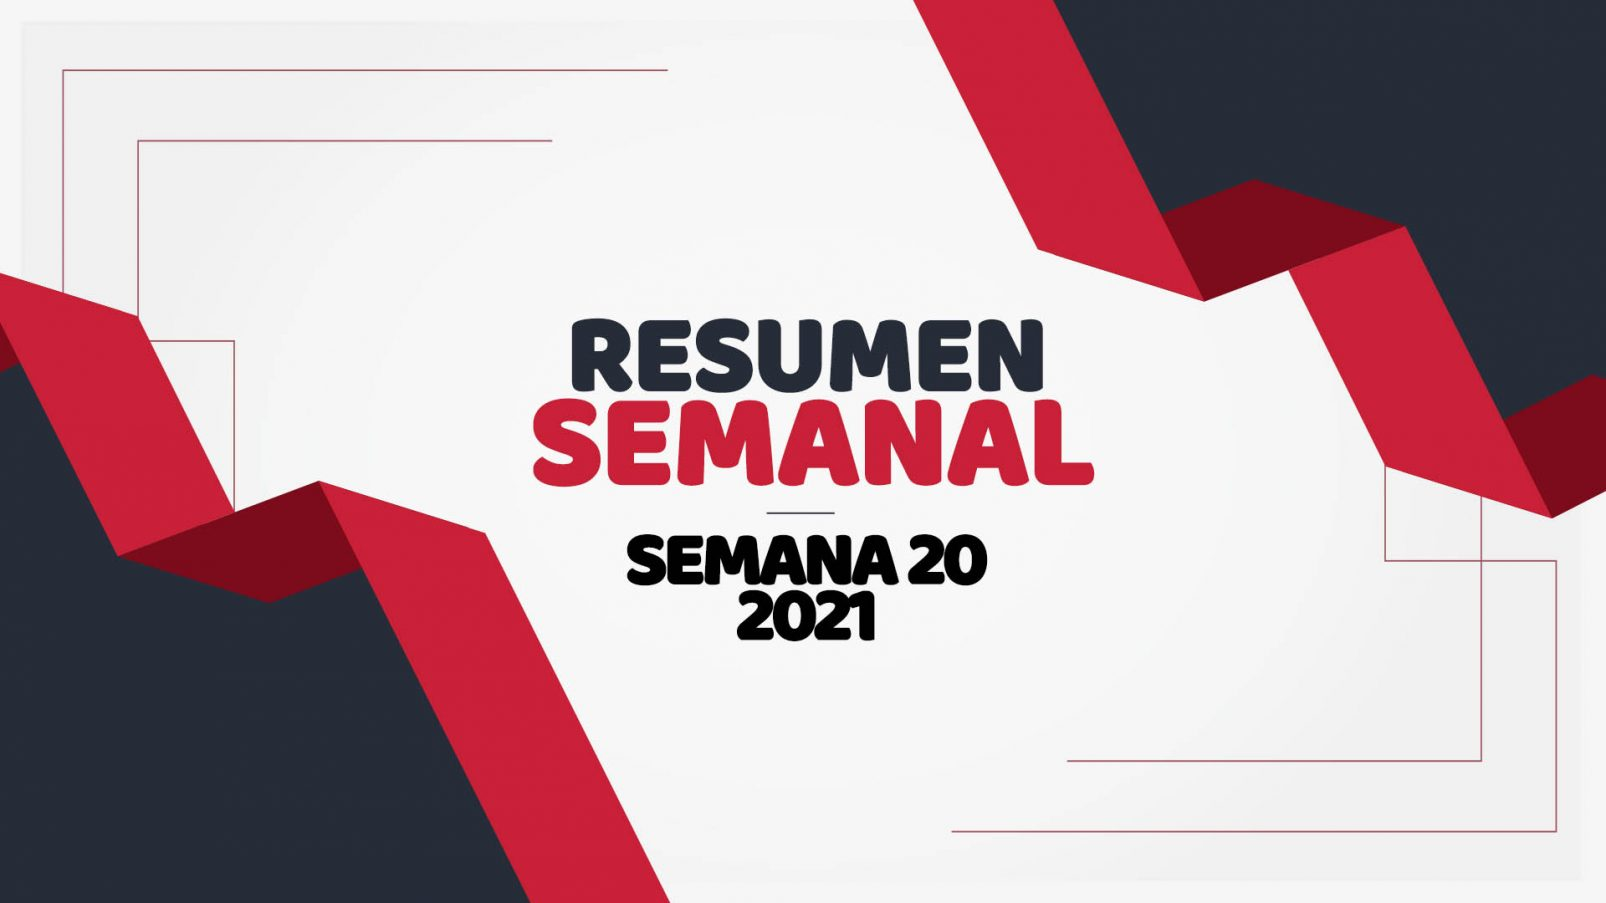 semana 20 de 2021